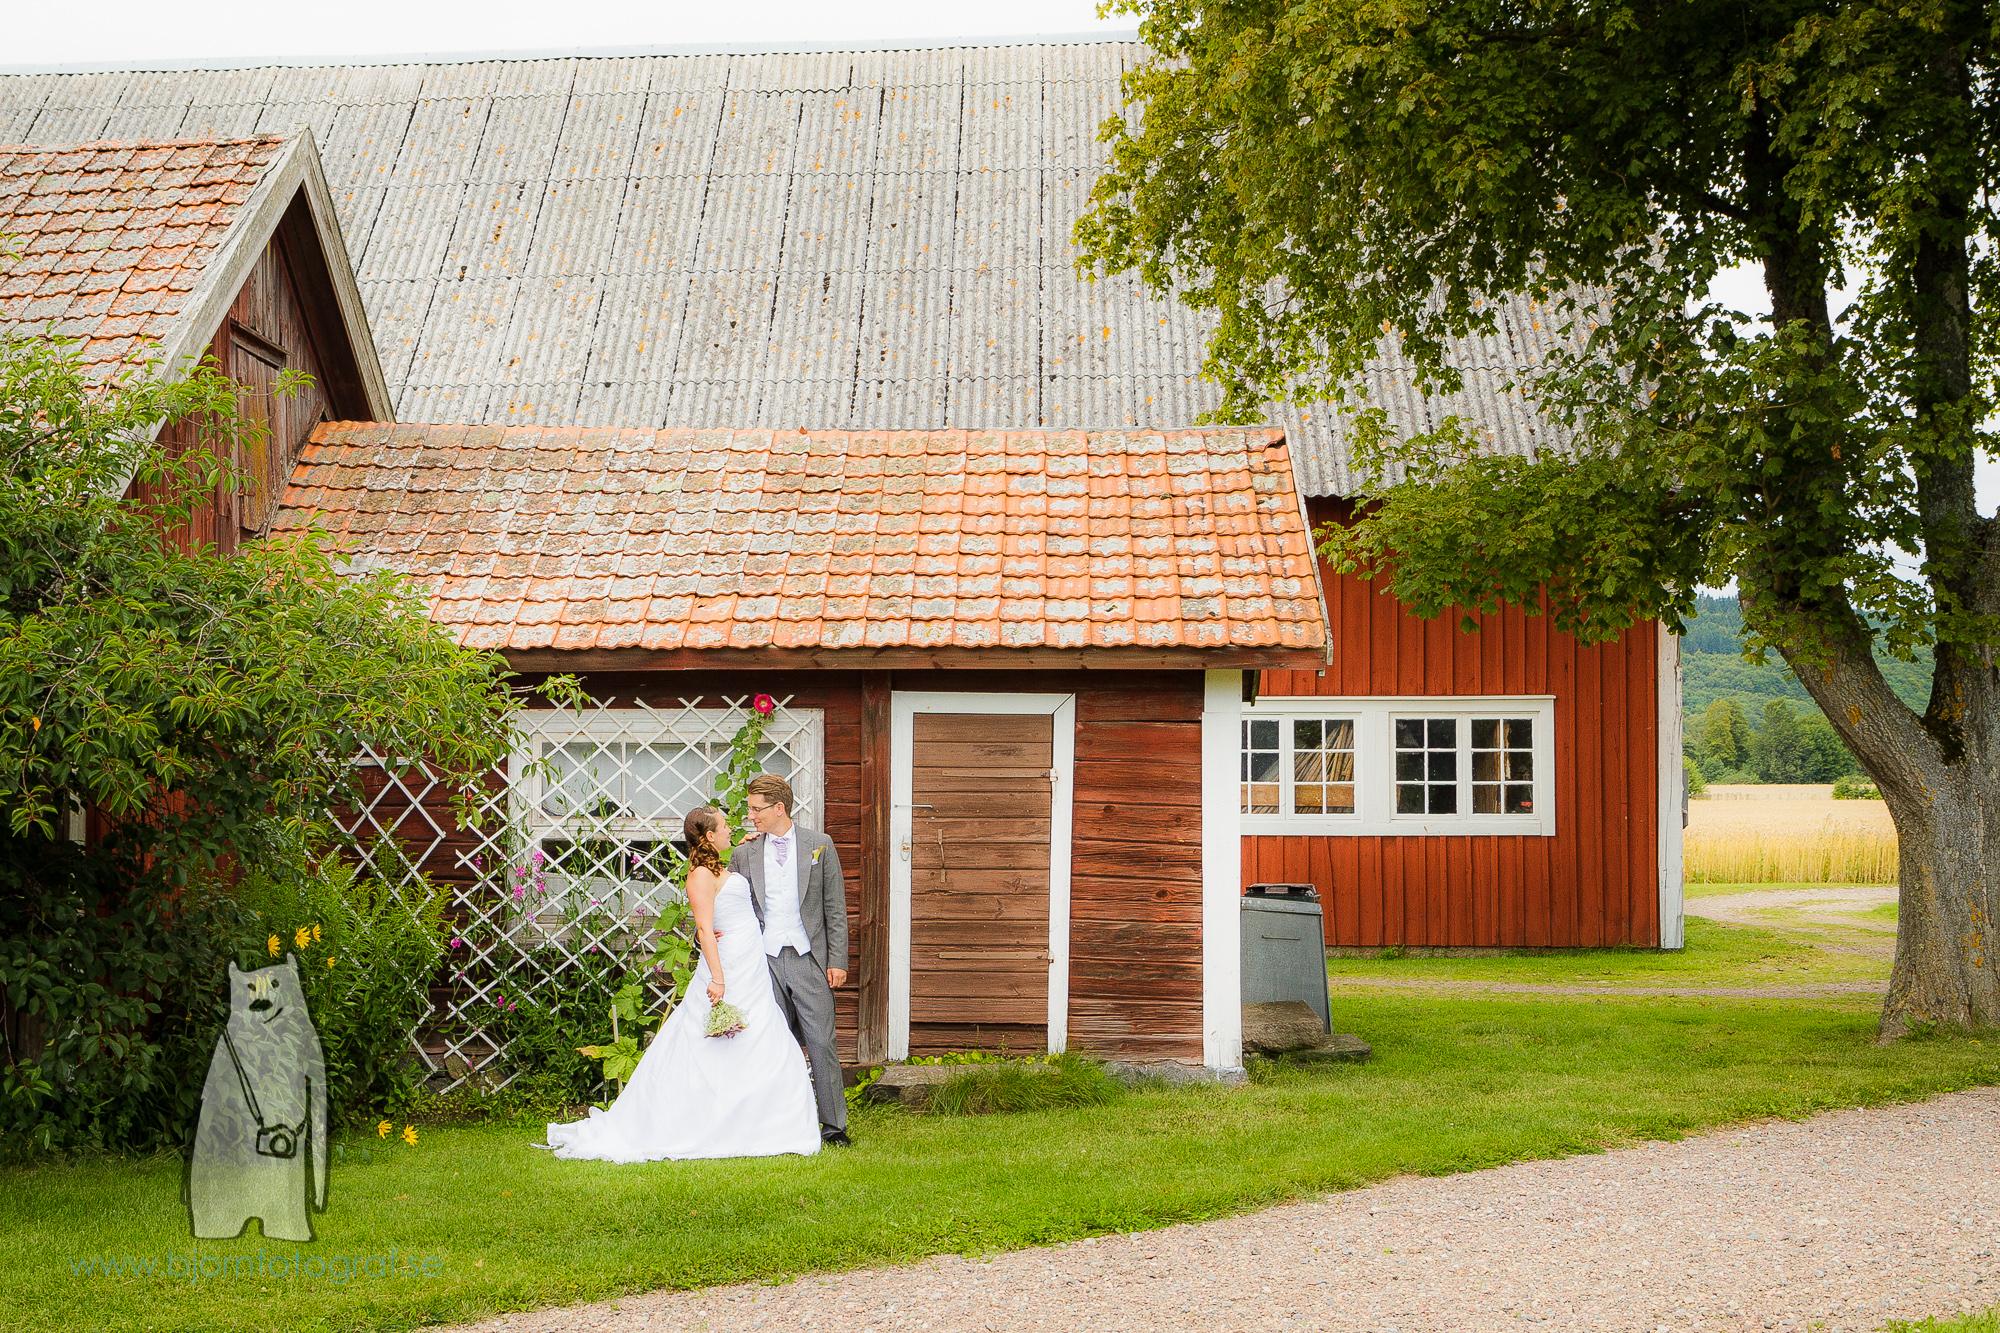 bjornfotograf.se-4885